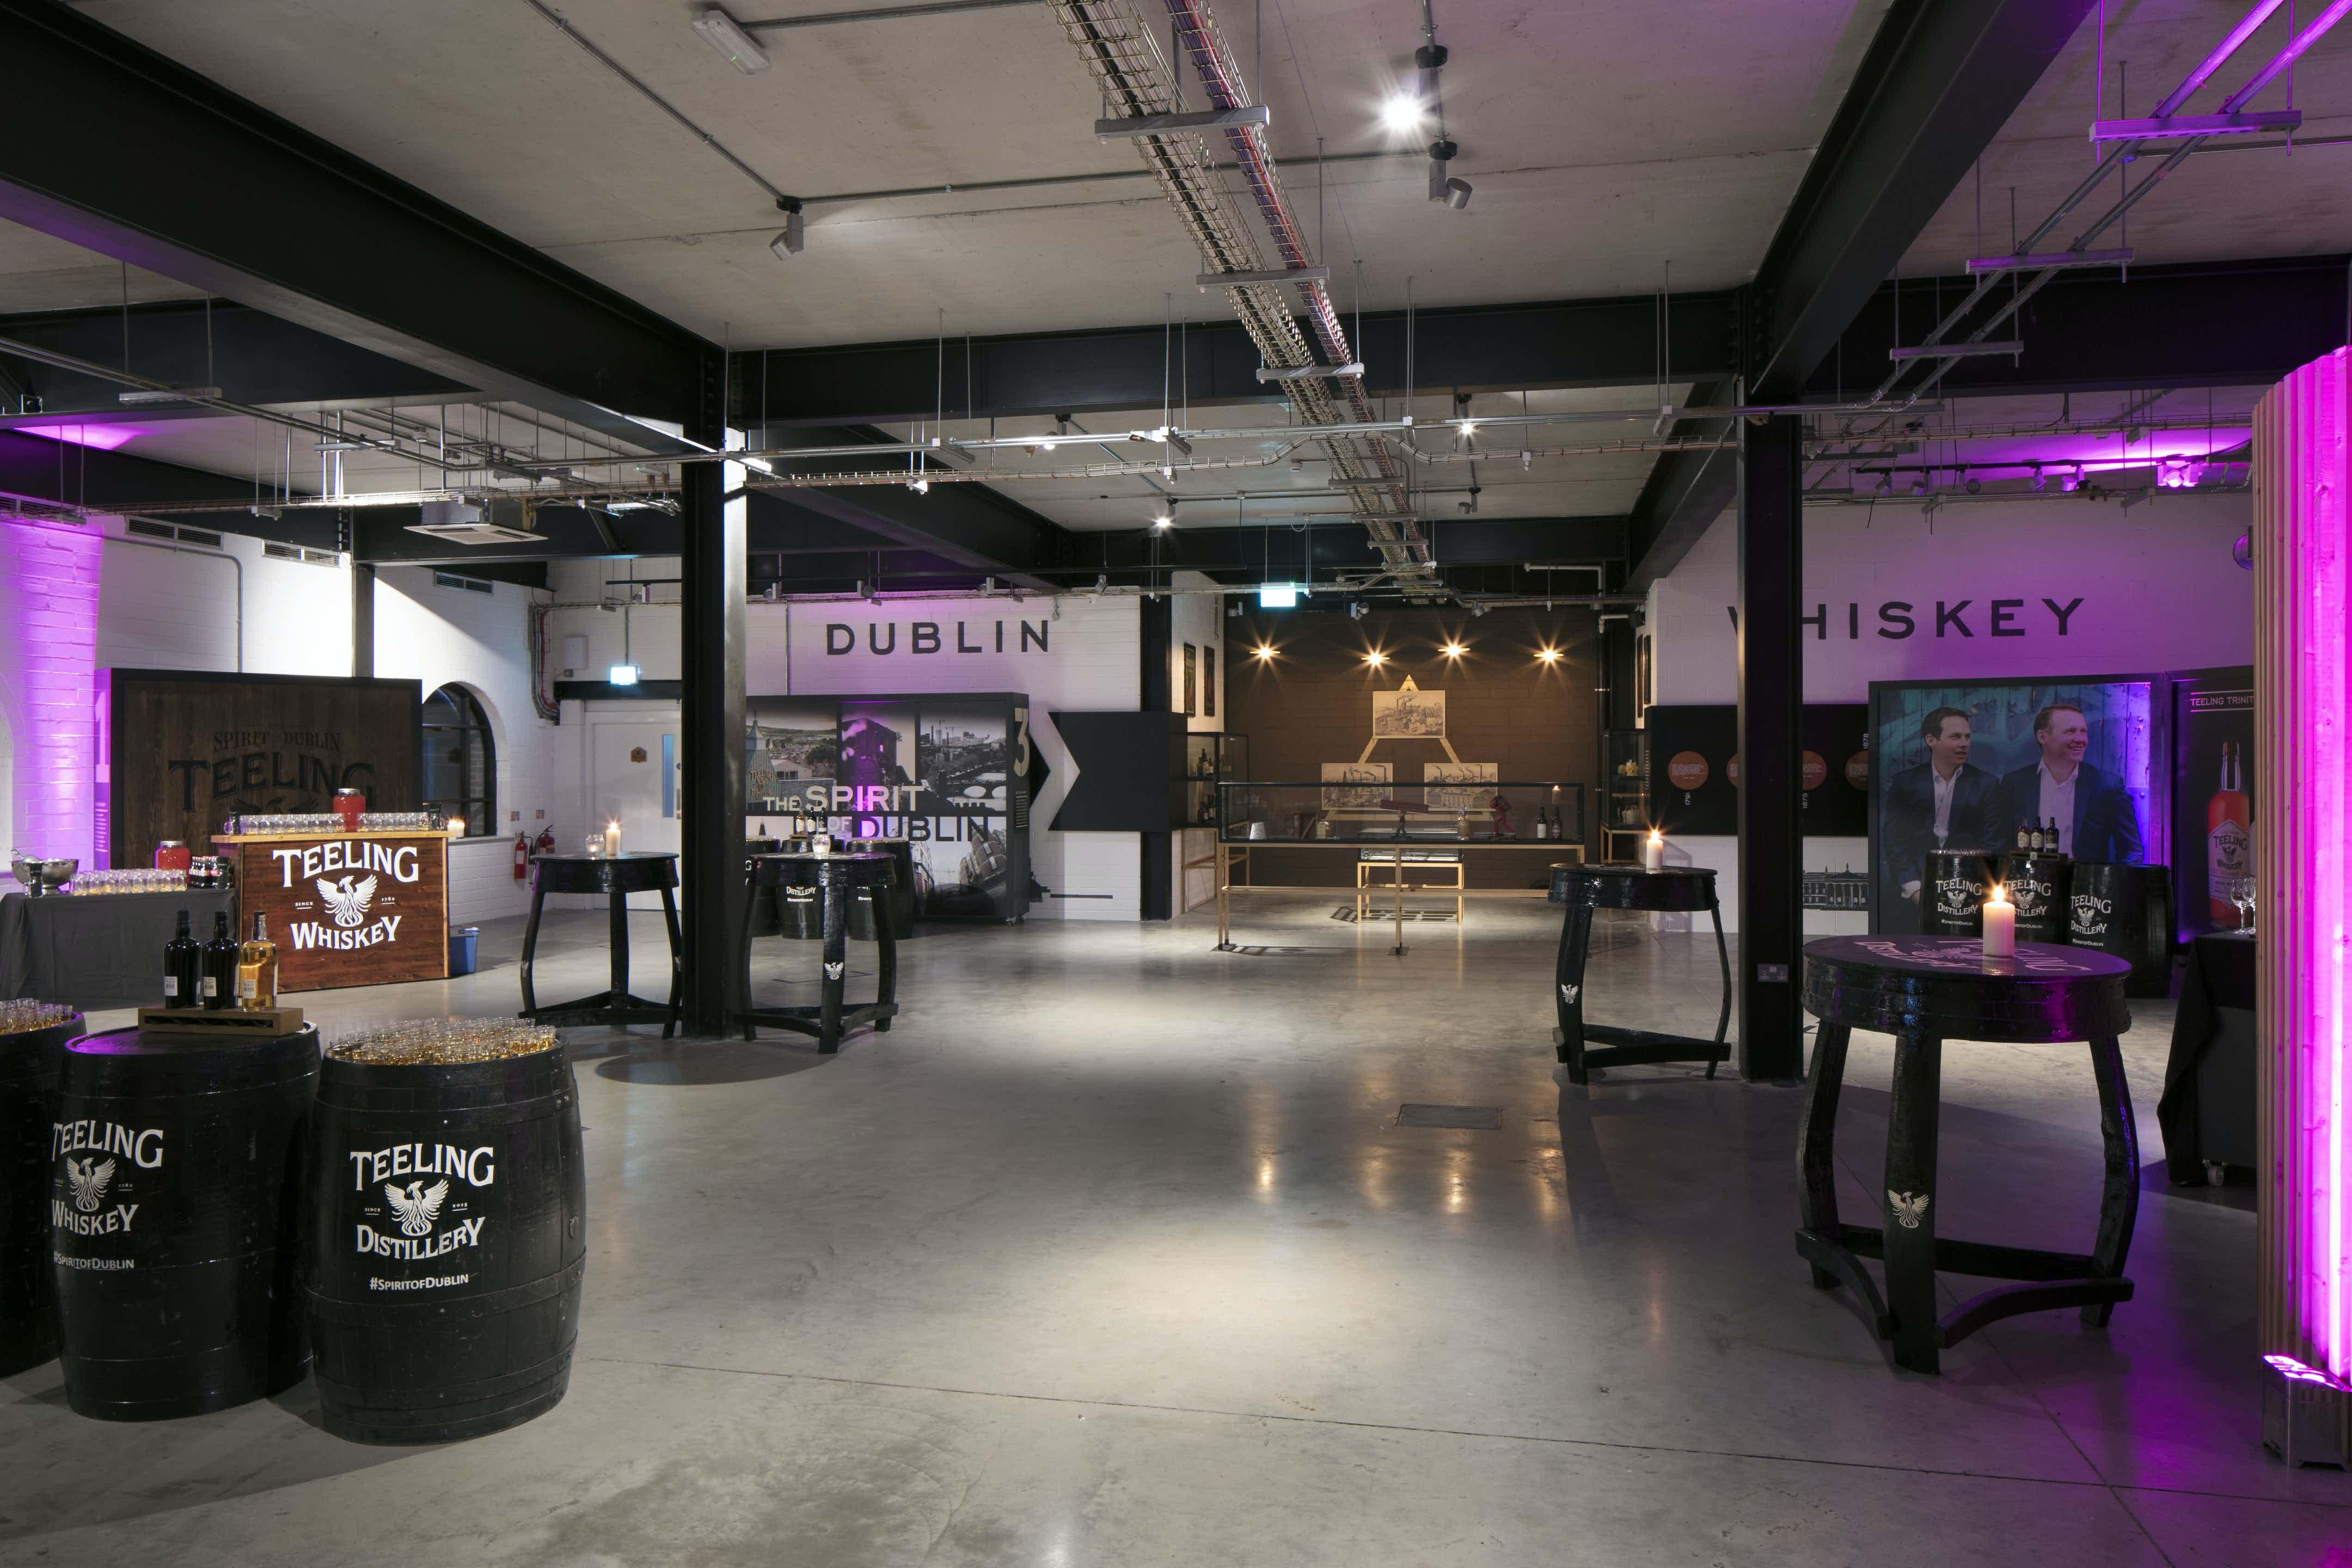 Exhibition Space, Teeling Whiskey Distillery